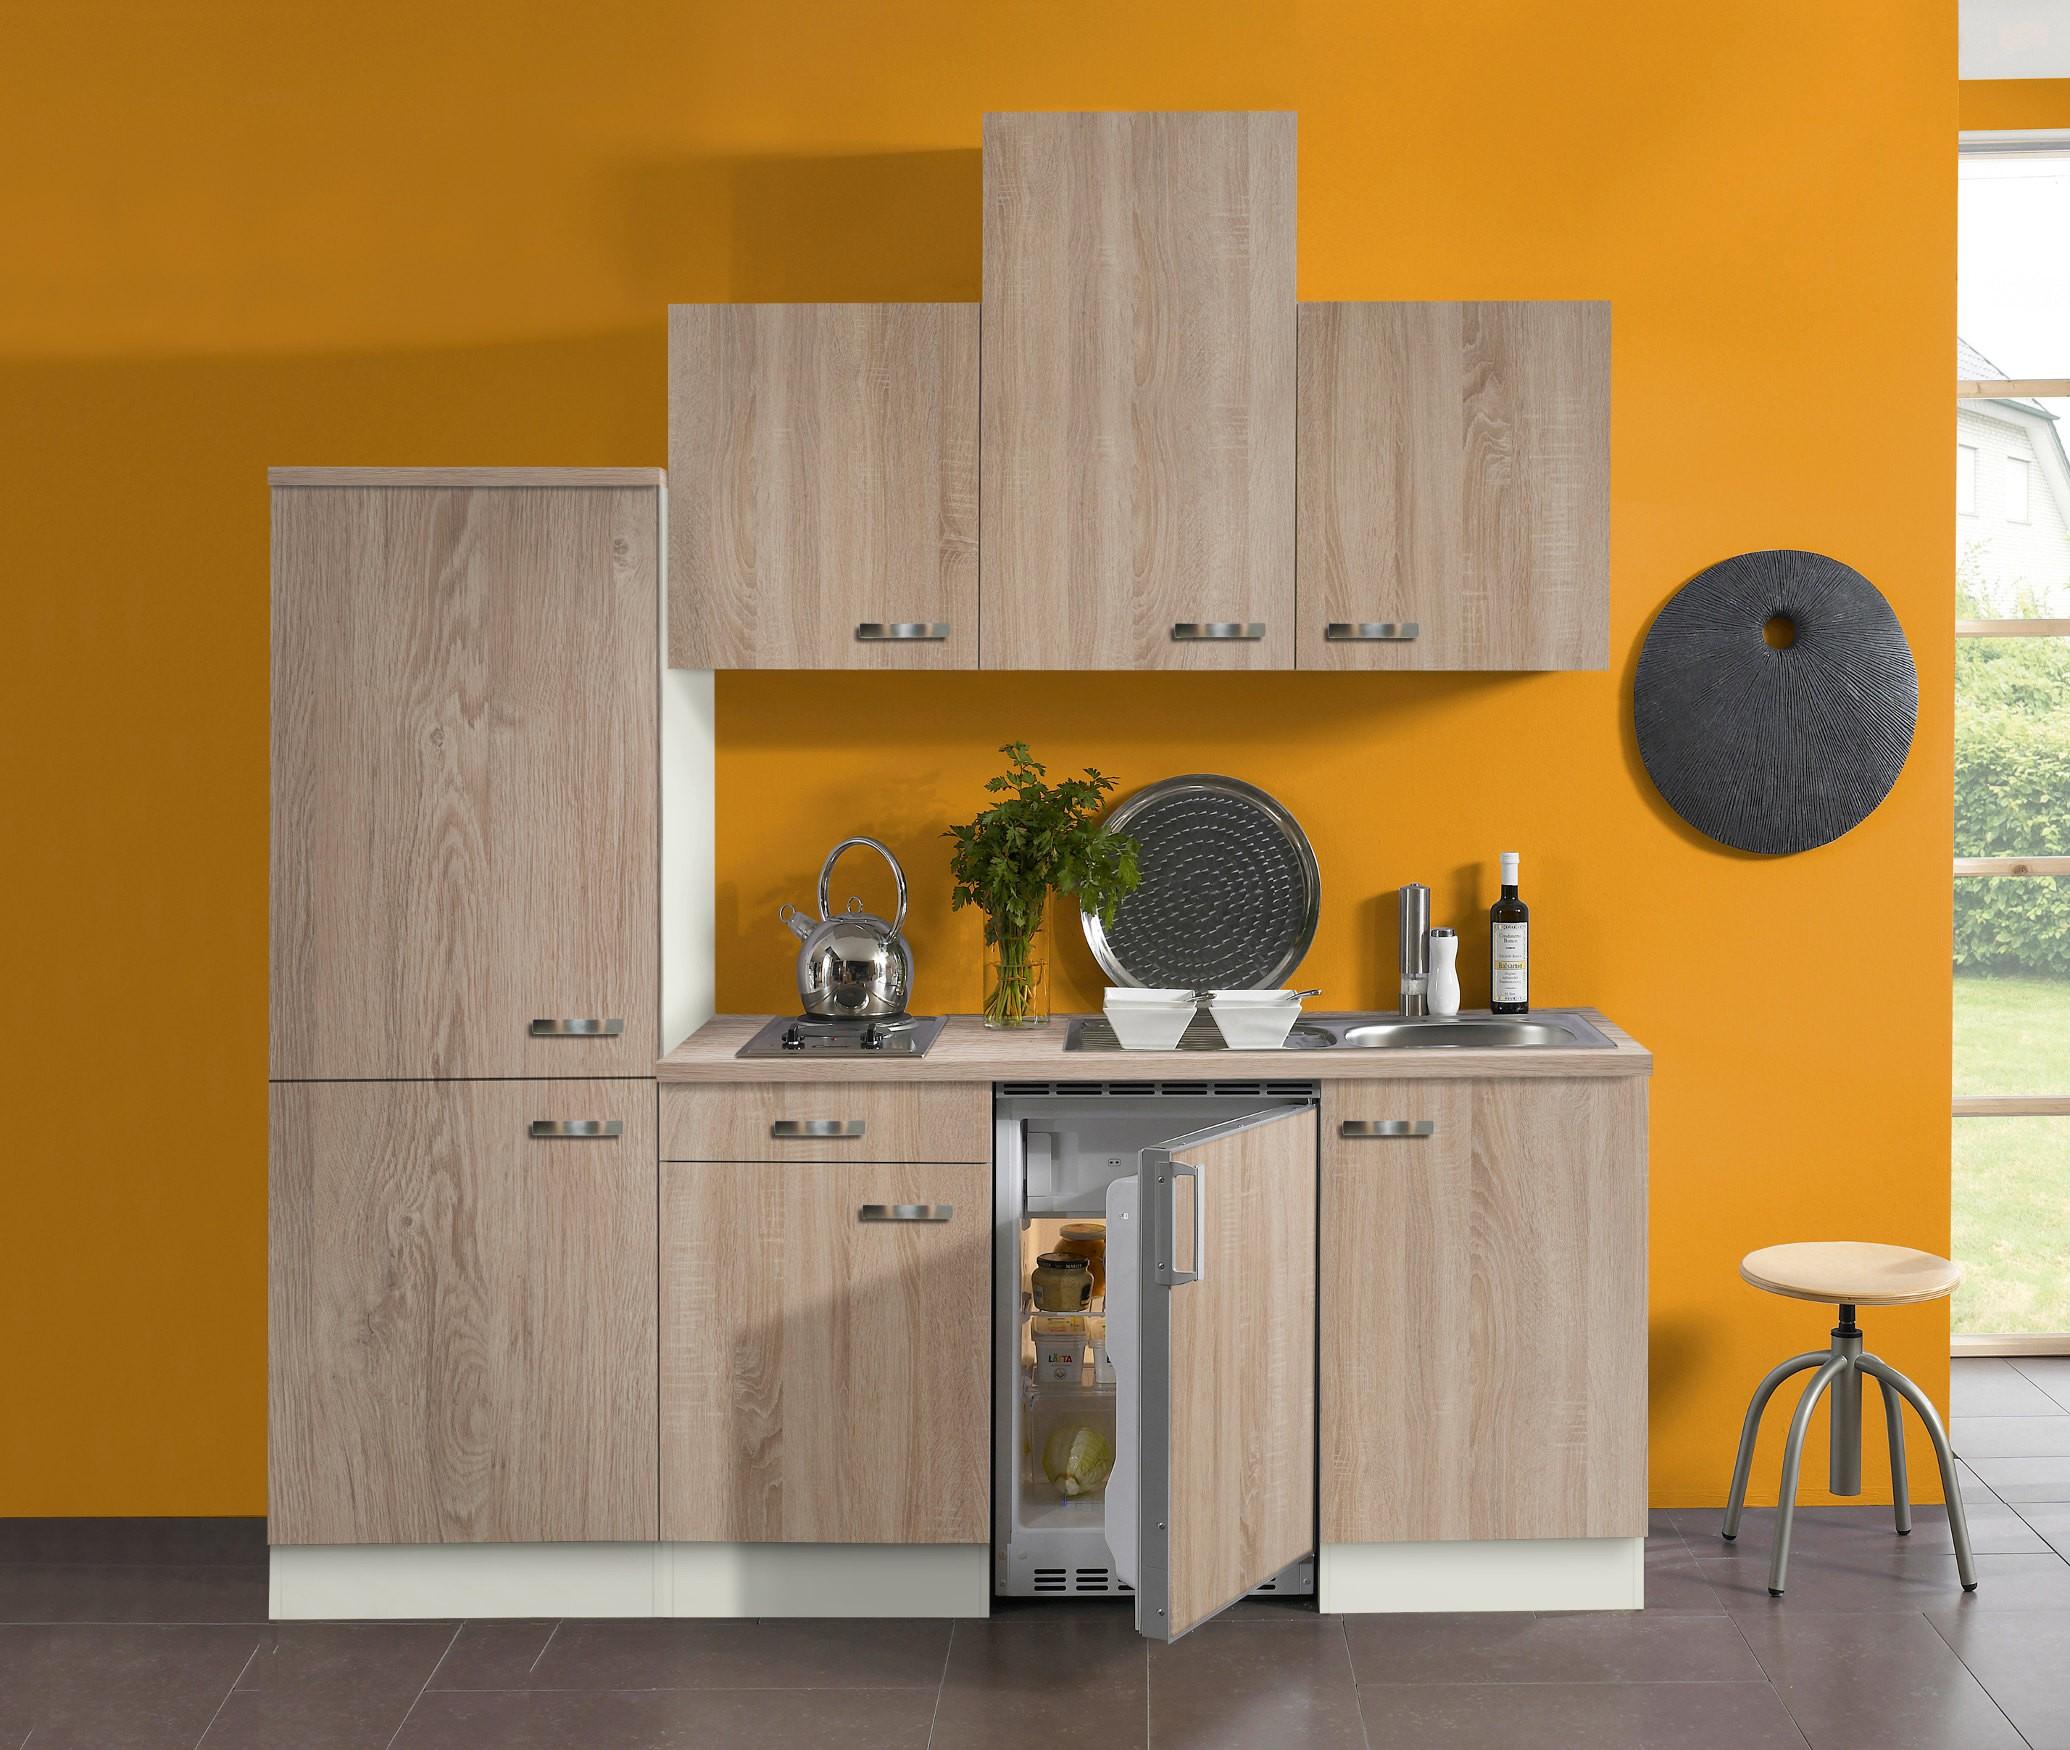 Singlekuche toledo vario 2 mit elektro kochfeld for Singleküche mit elektroger ten